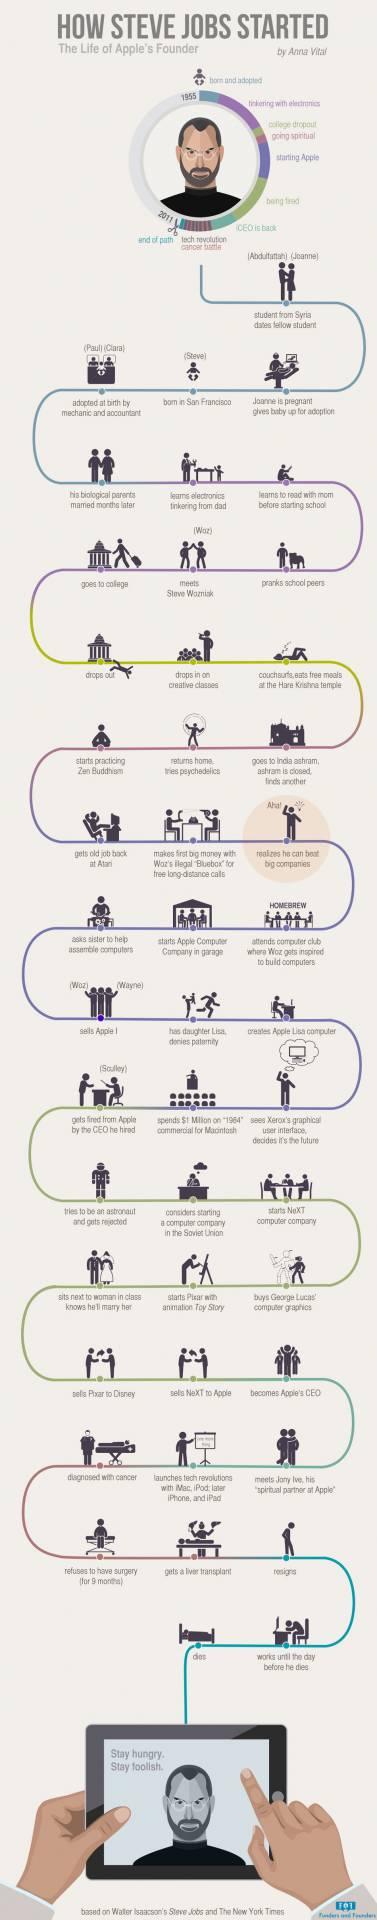 1rx1nzm Nuova infografica mostra i punti fondamentali della storia di Steve Jobs